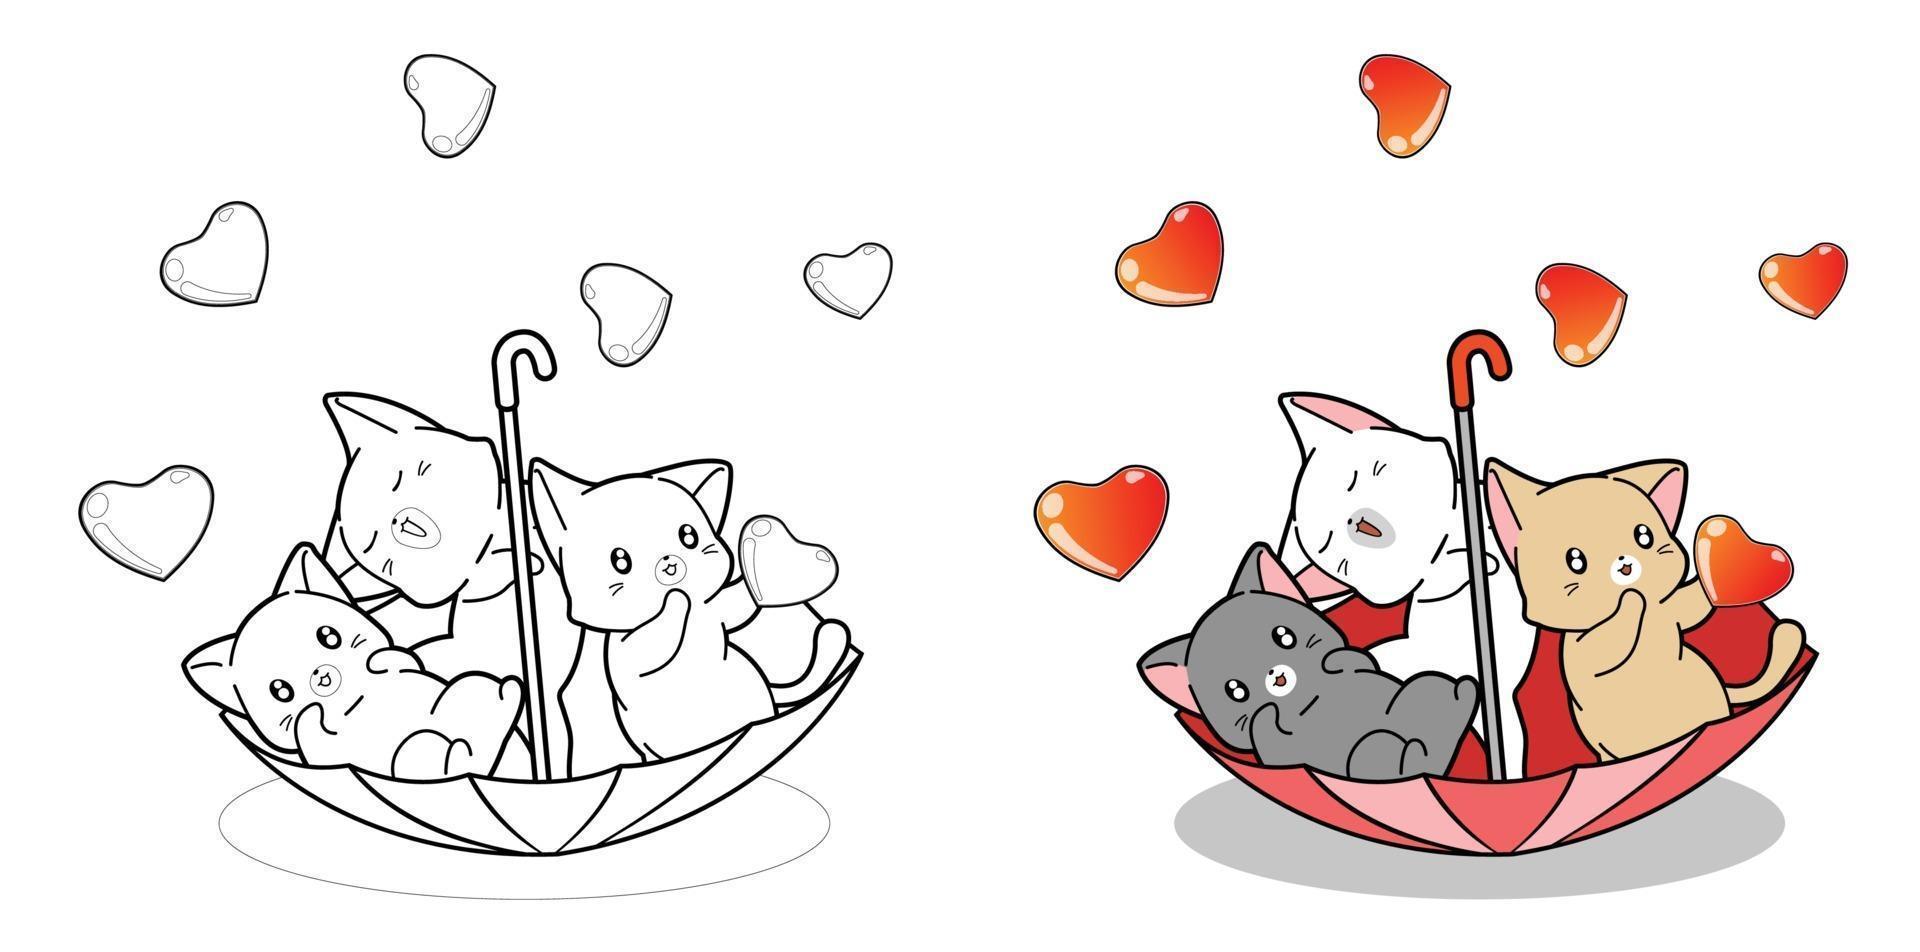 Ist cartoon liebe Cartoon Liebe